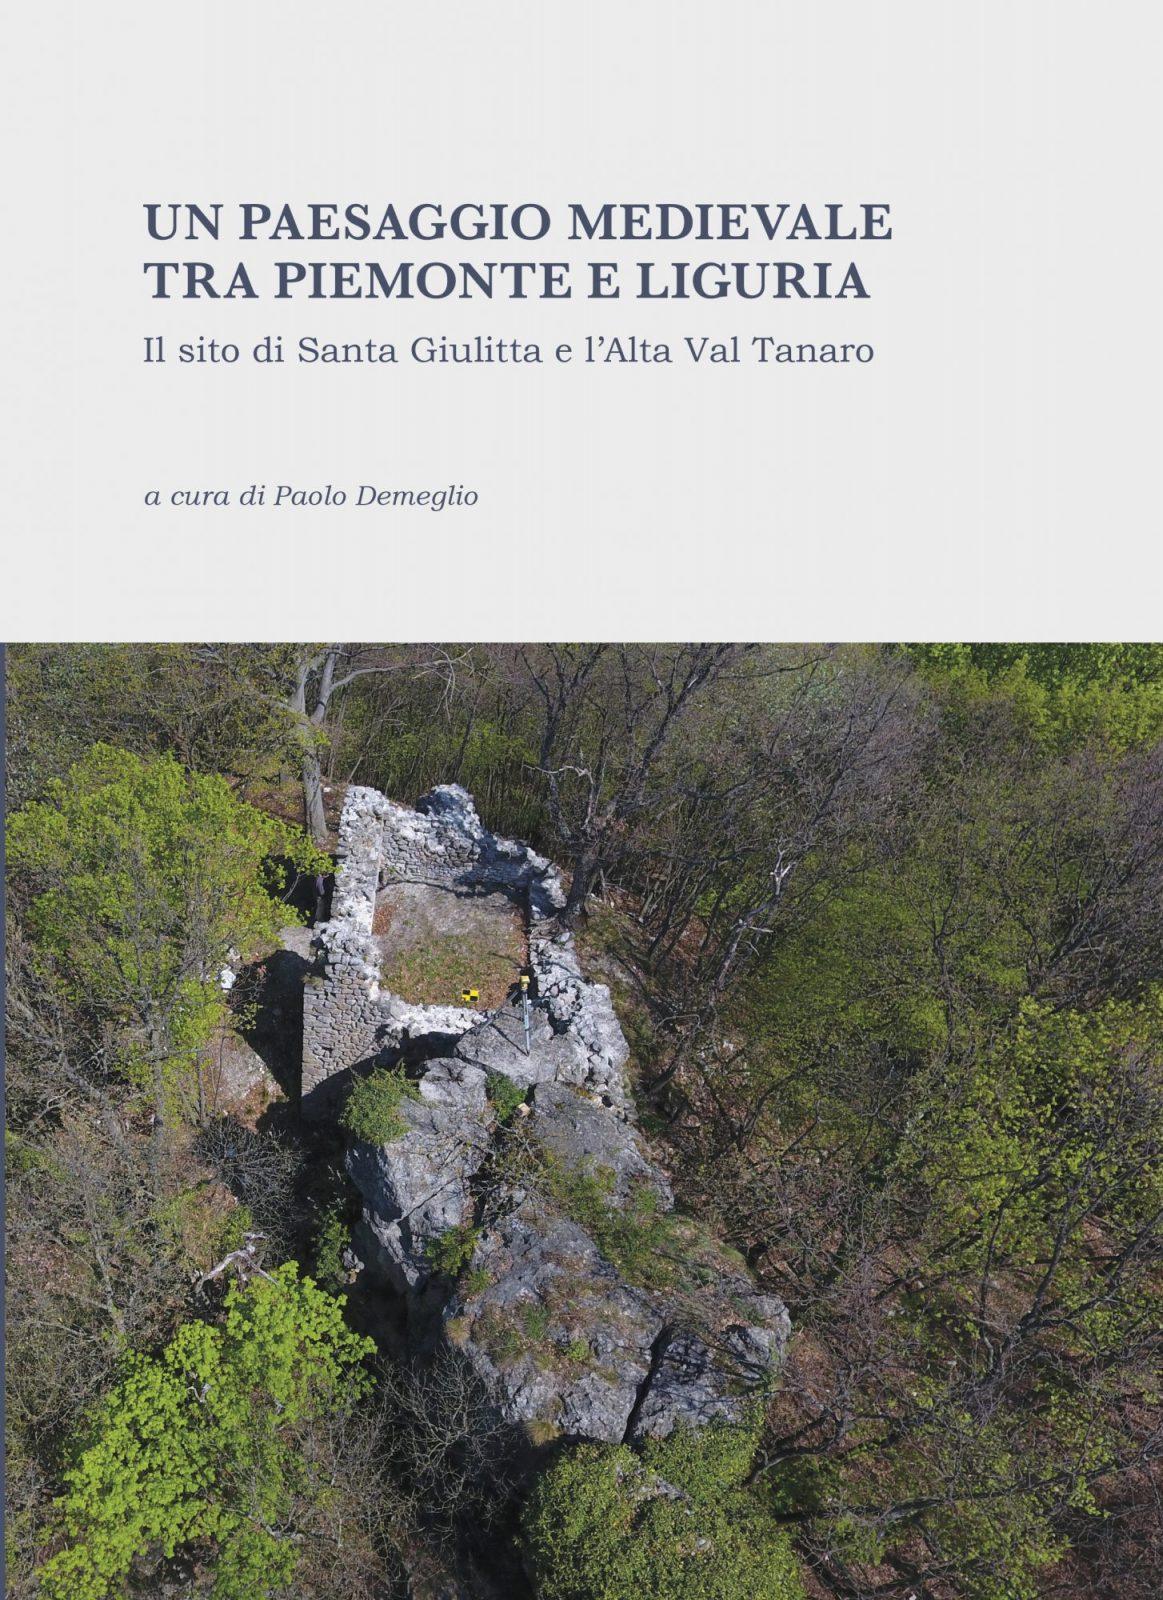 Heredium 1. Santa Giulitta, copertina.